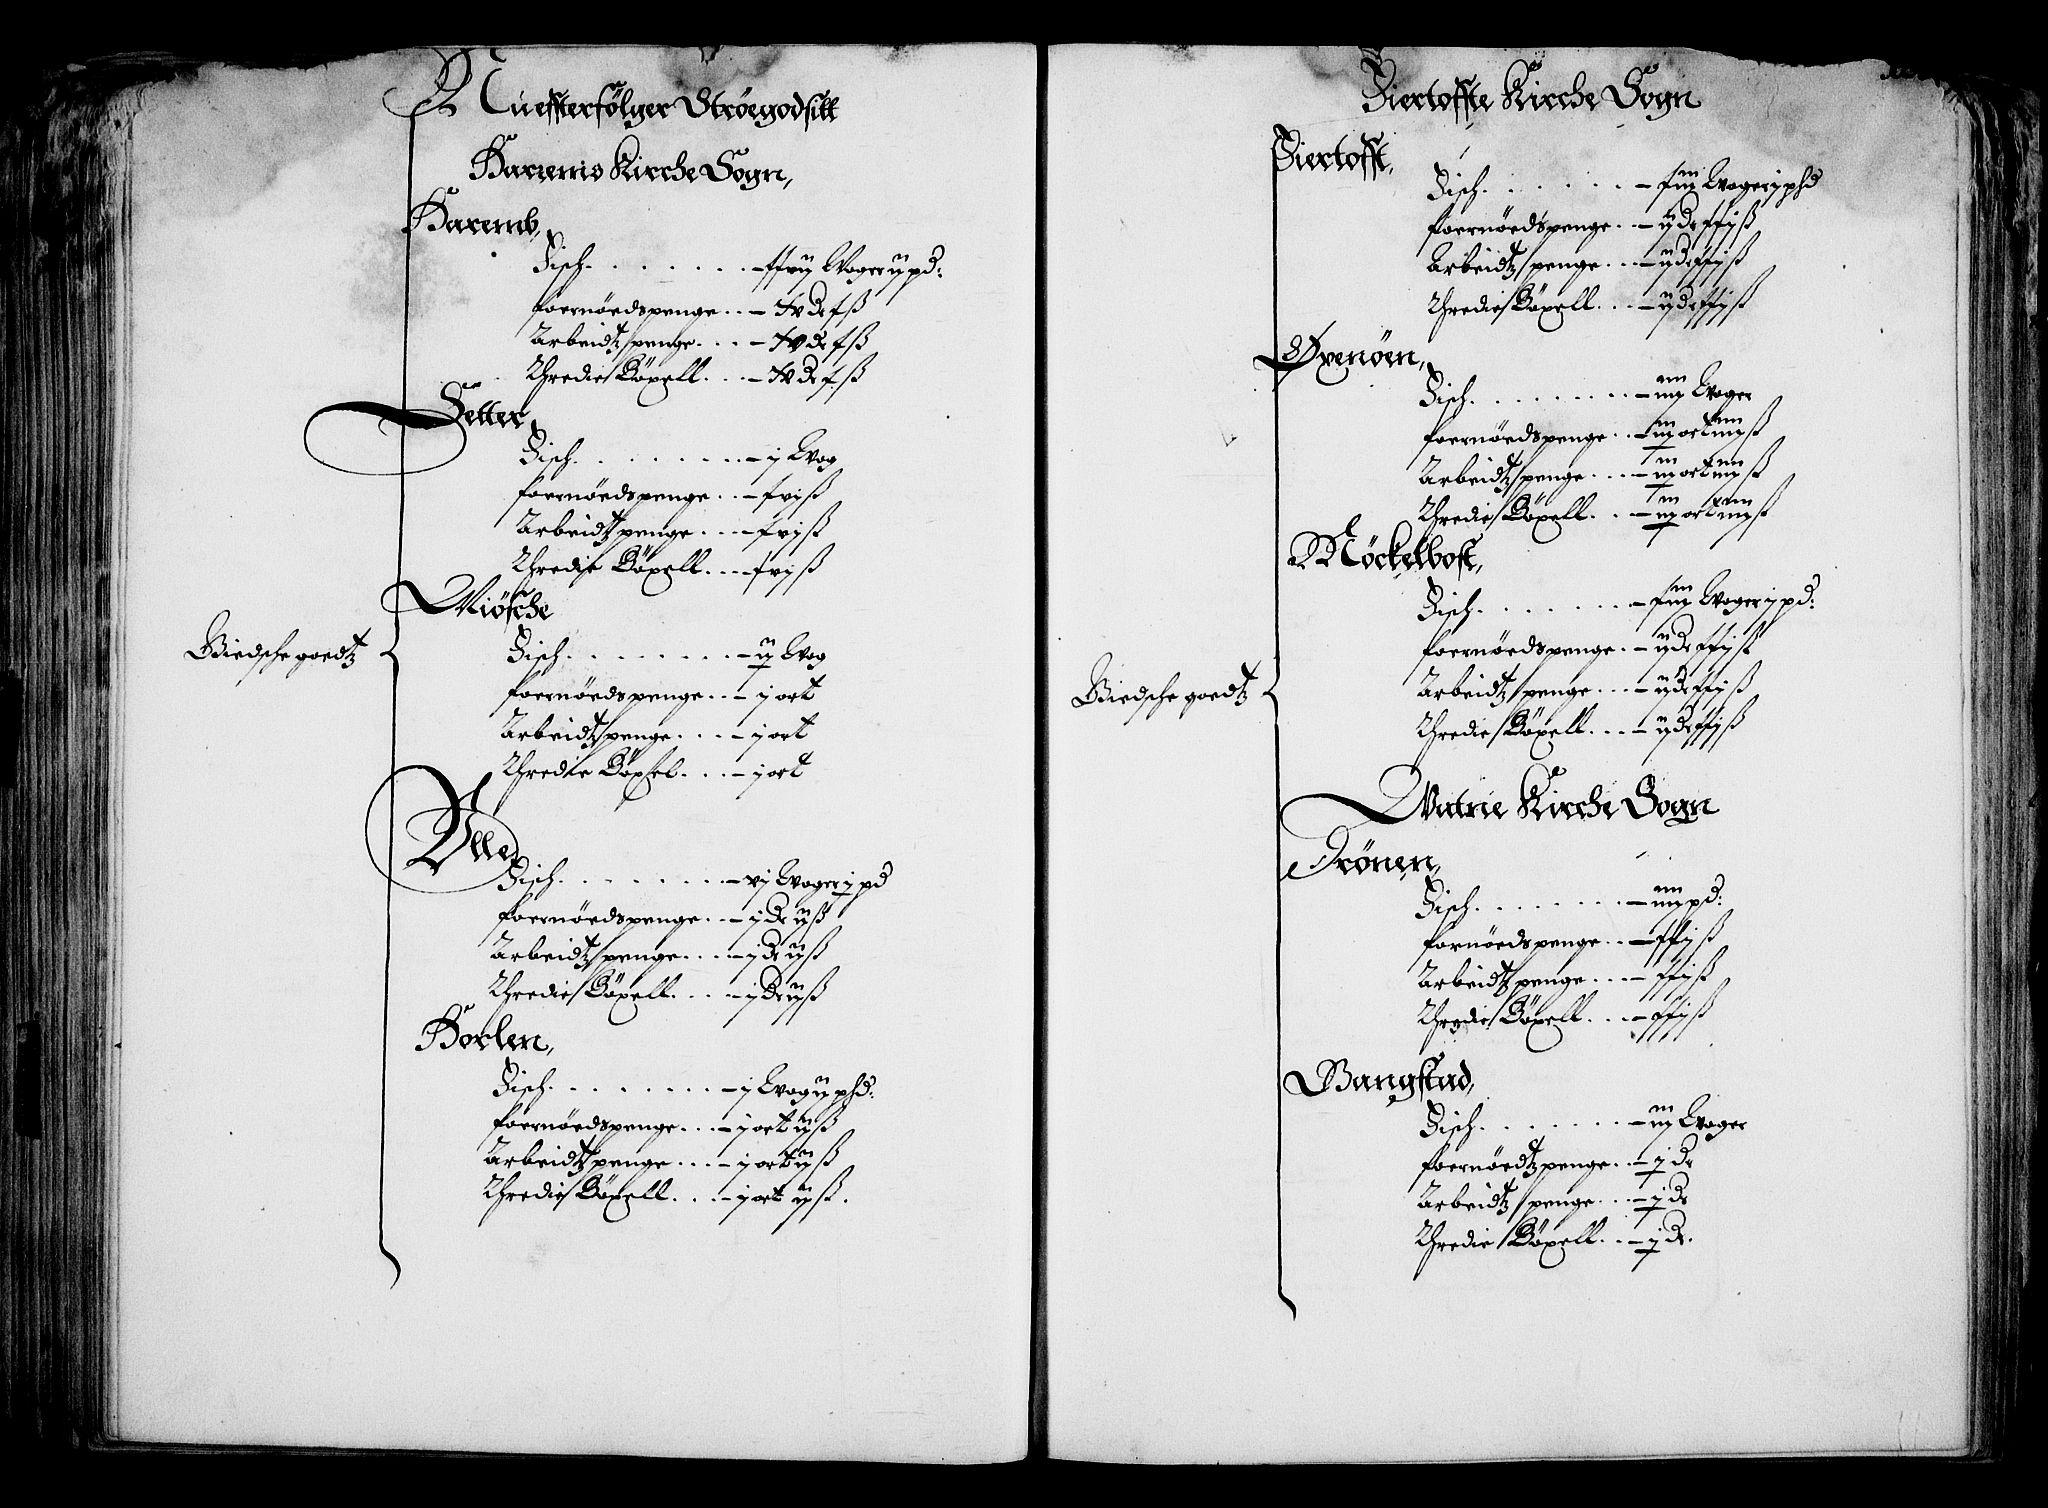 RA, Rentekammeret inntil 1814, Realistisk ordnet avdeling, On/L0001: Statens gods, 1651, s. 173